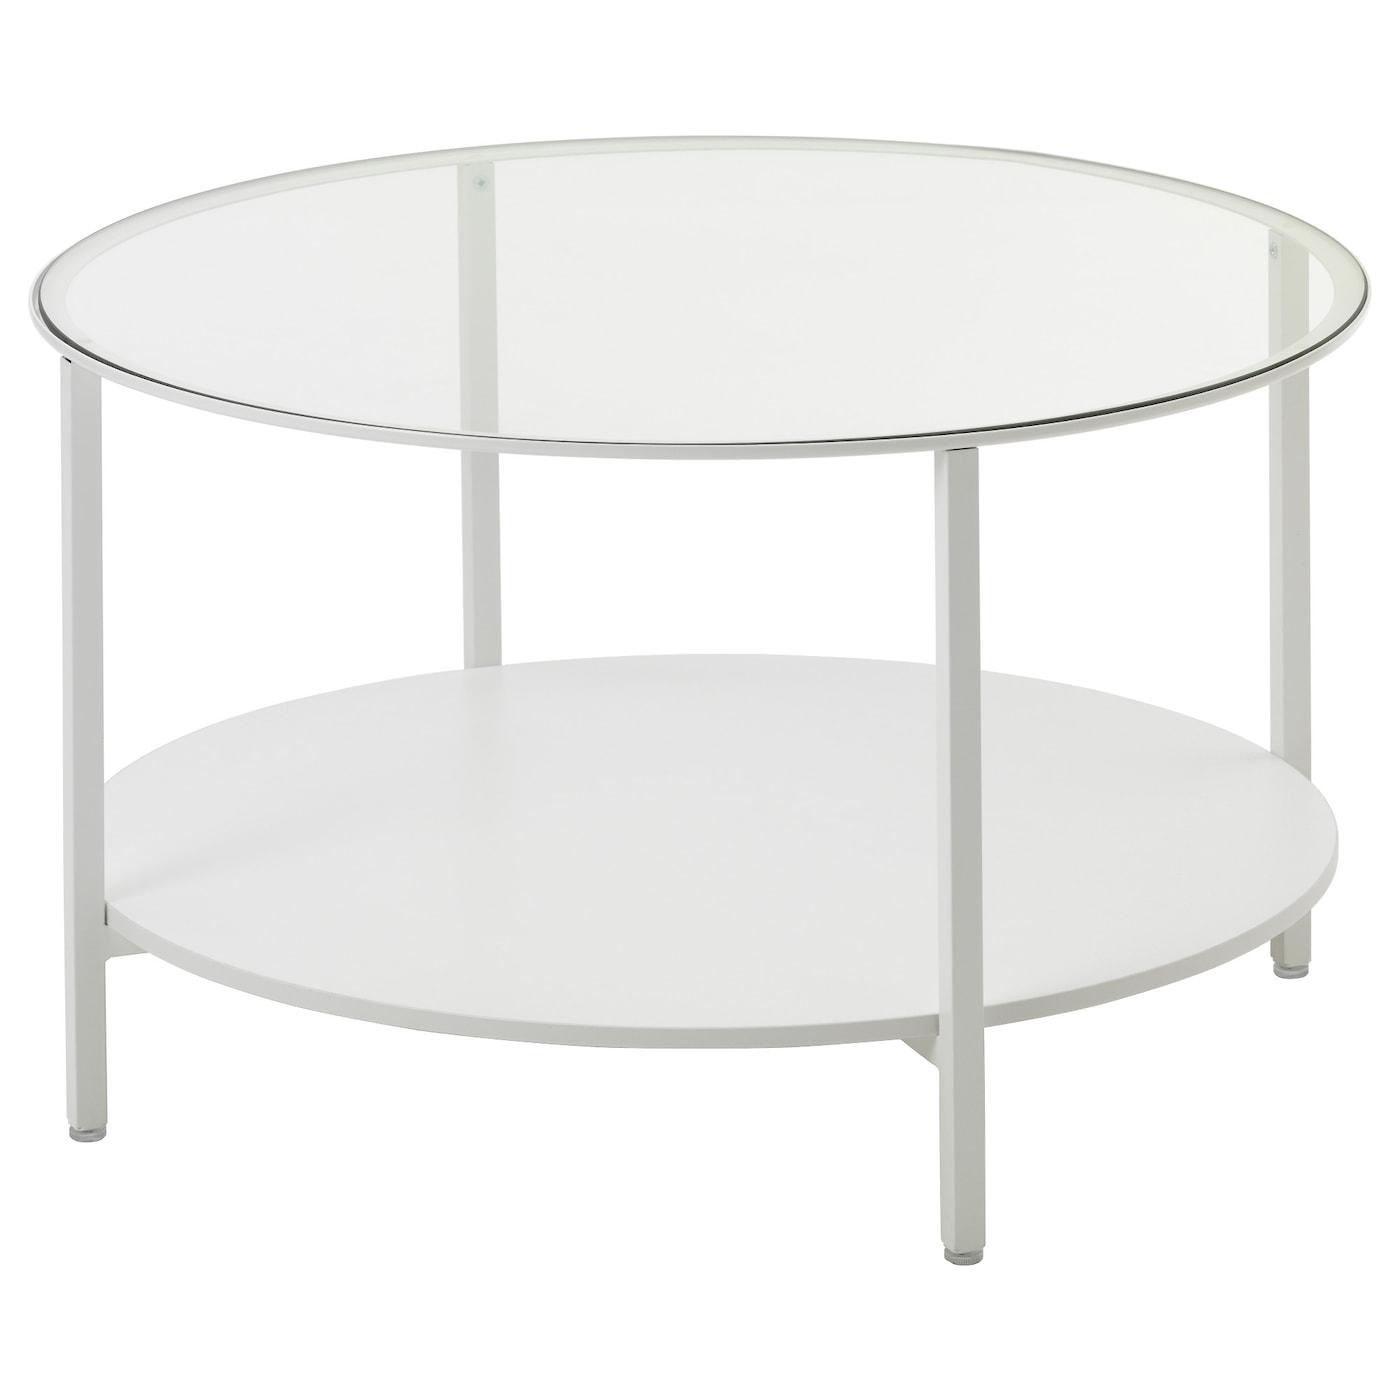 - VITTSJÖ Coffee Table - White, Glass - IKEA